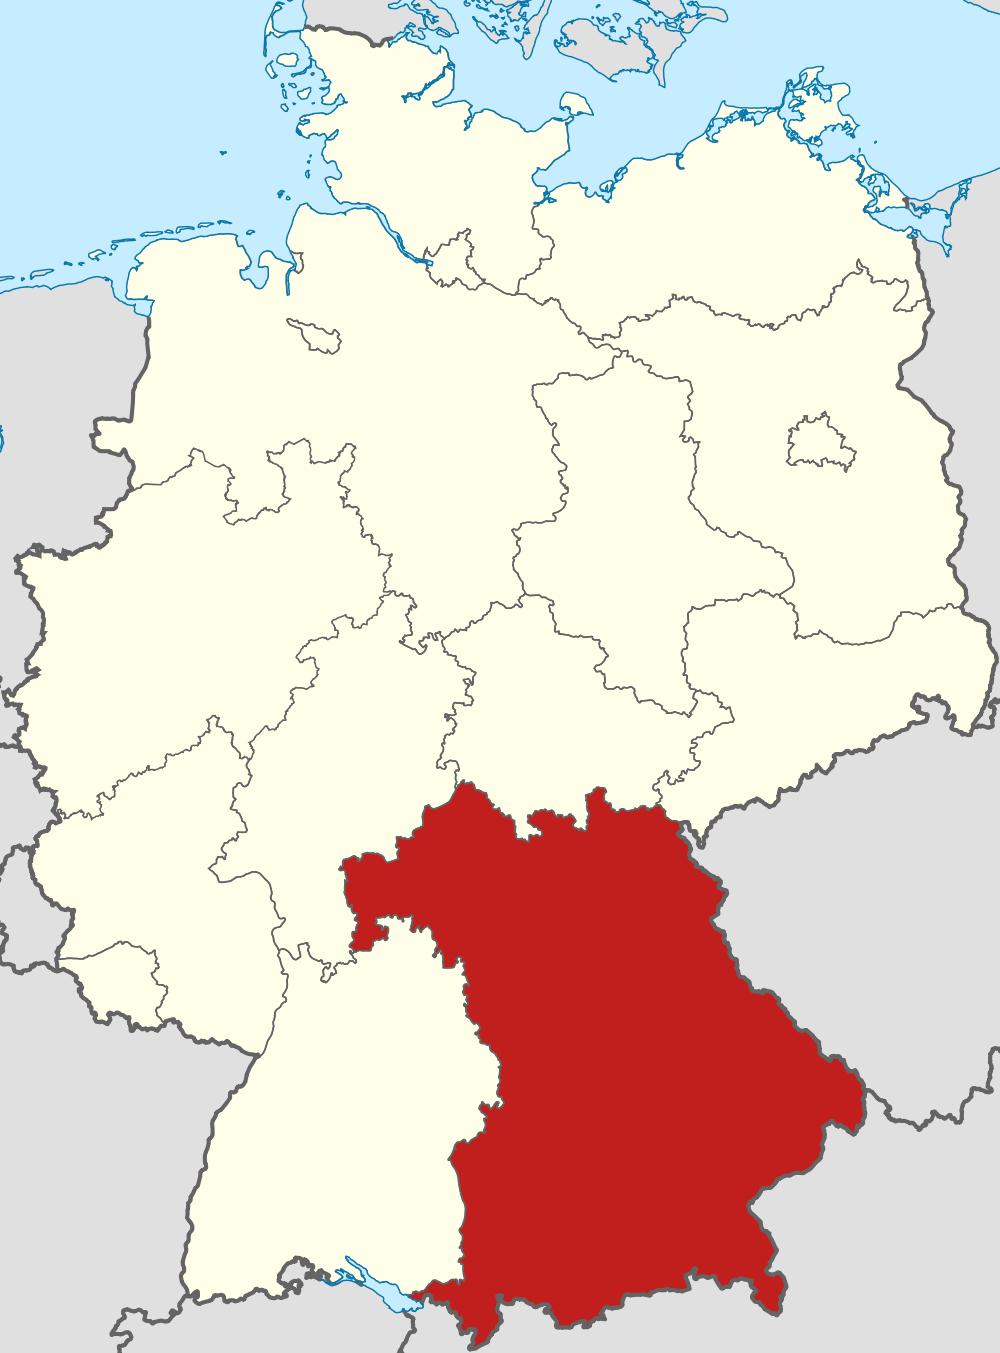 Bavaria, Germany Source: Wikimedia